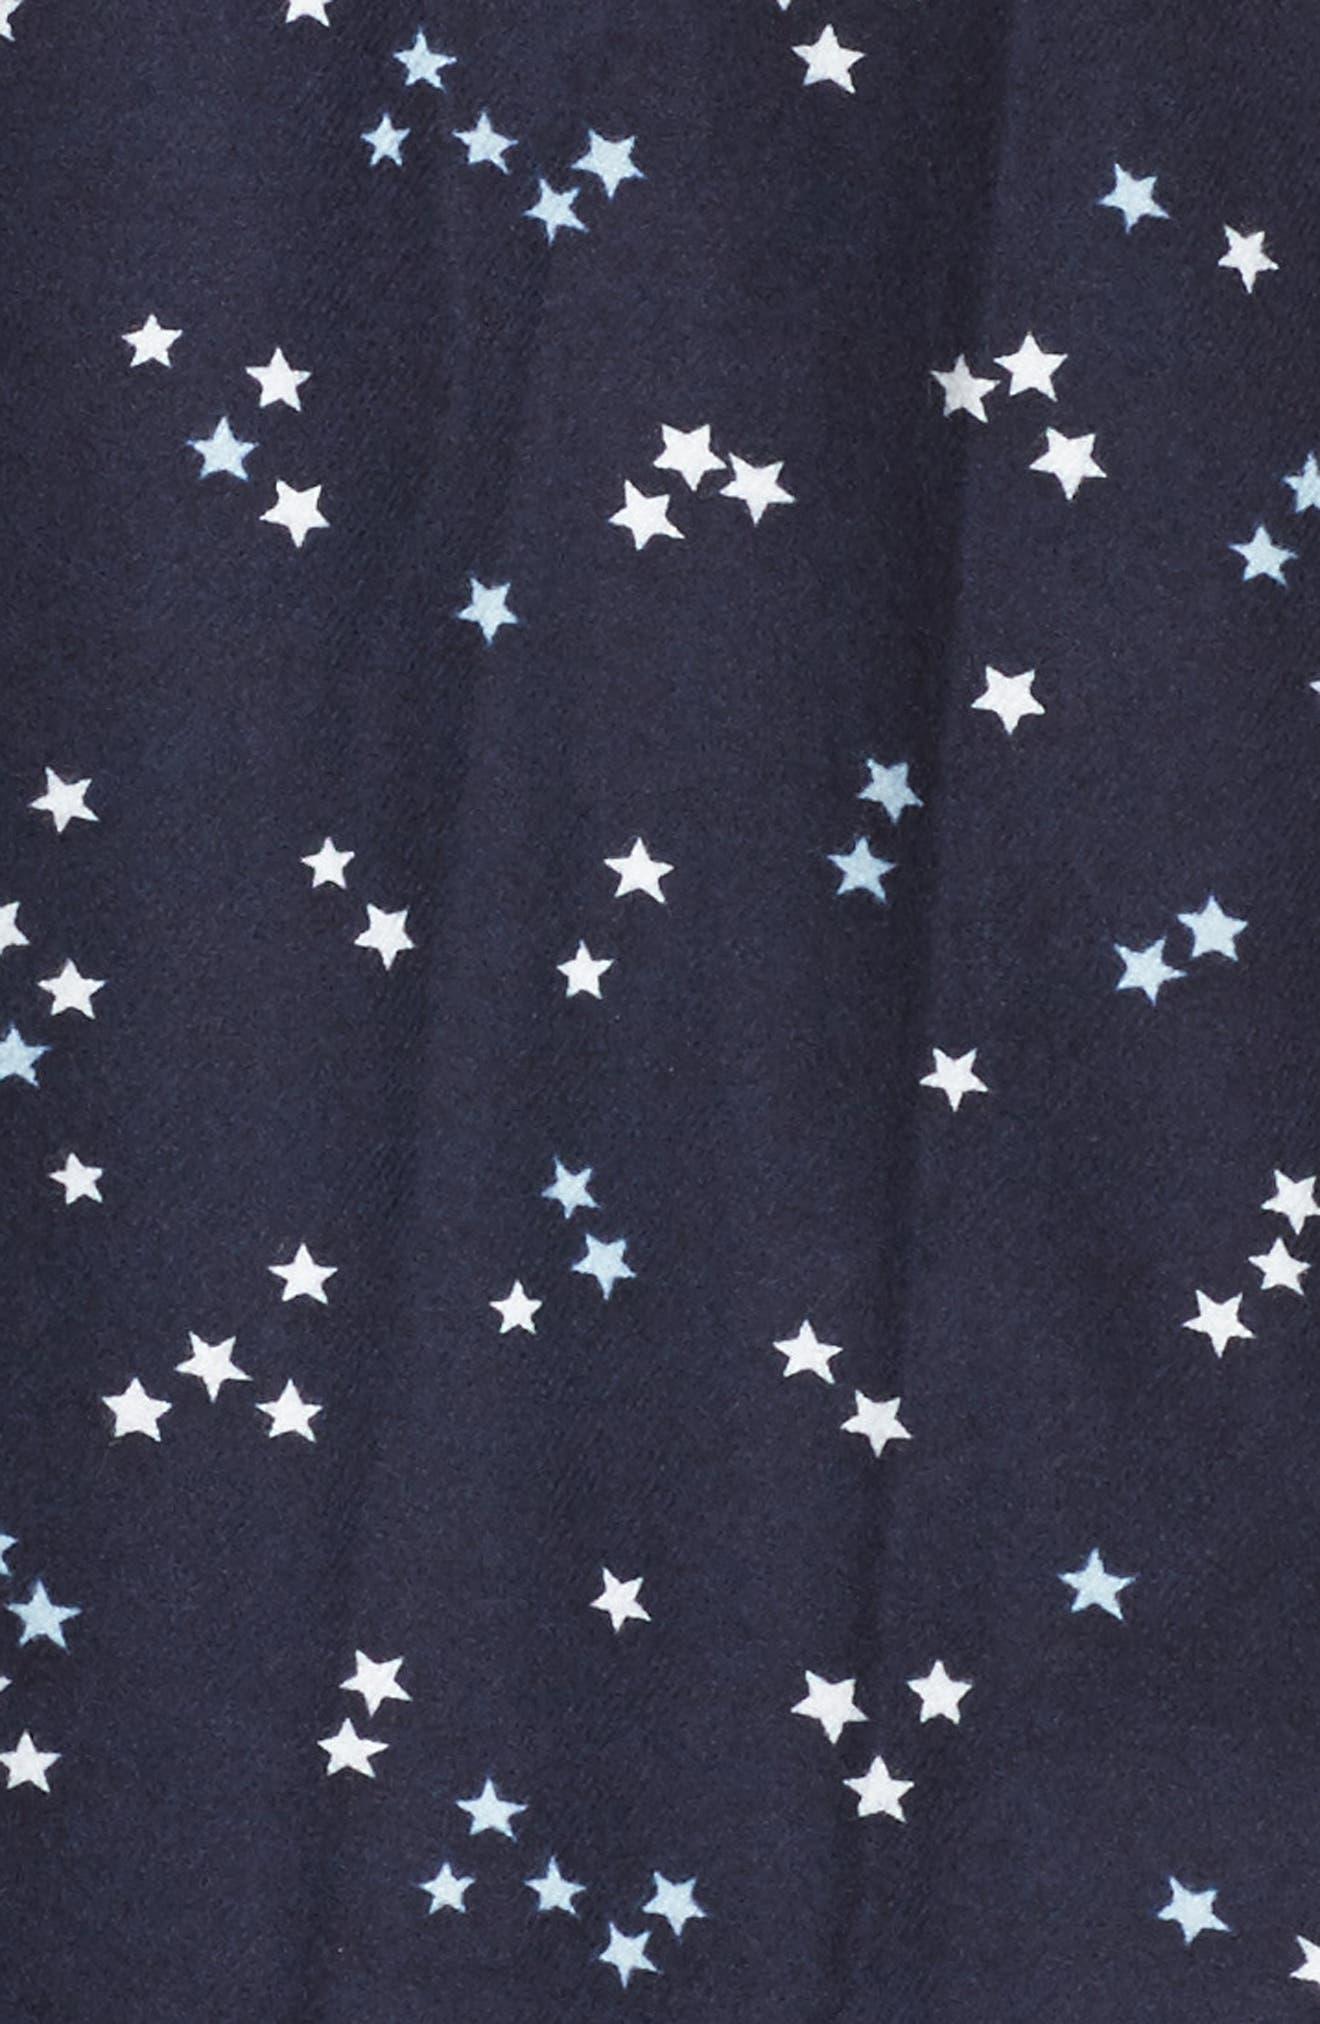 Lingerie Starlight Flannel Pajamas,                             Alternate thumbnail 23, color,